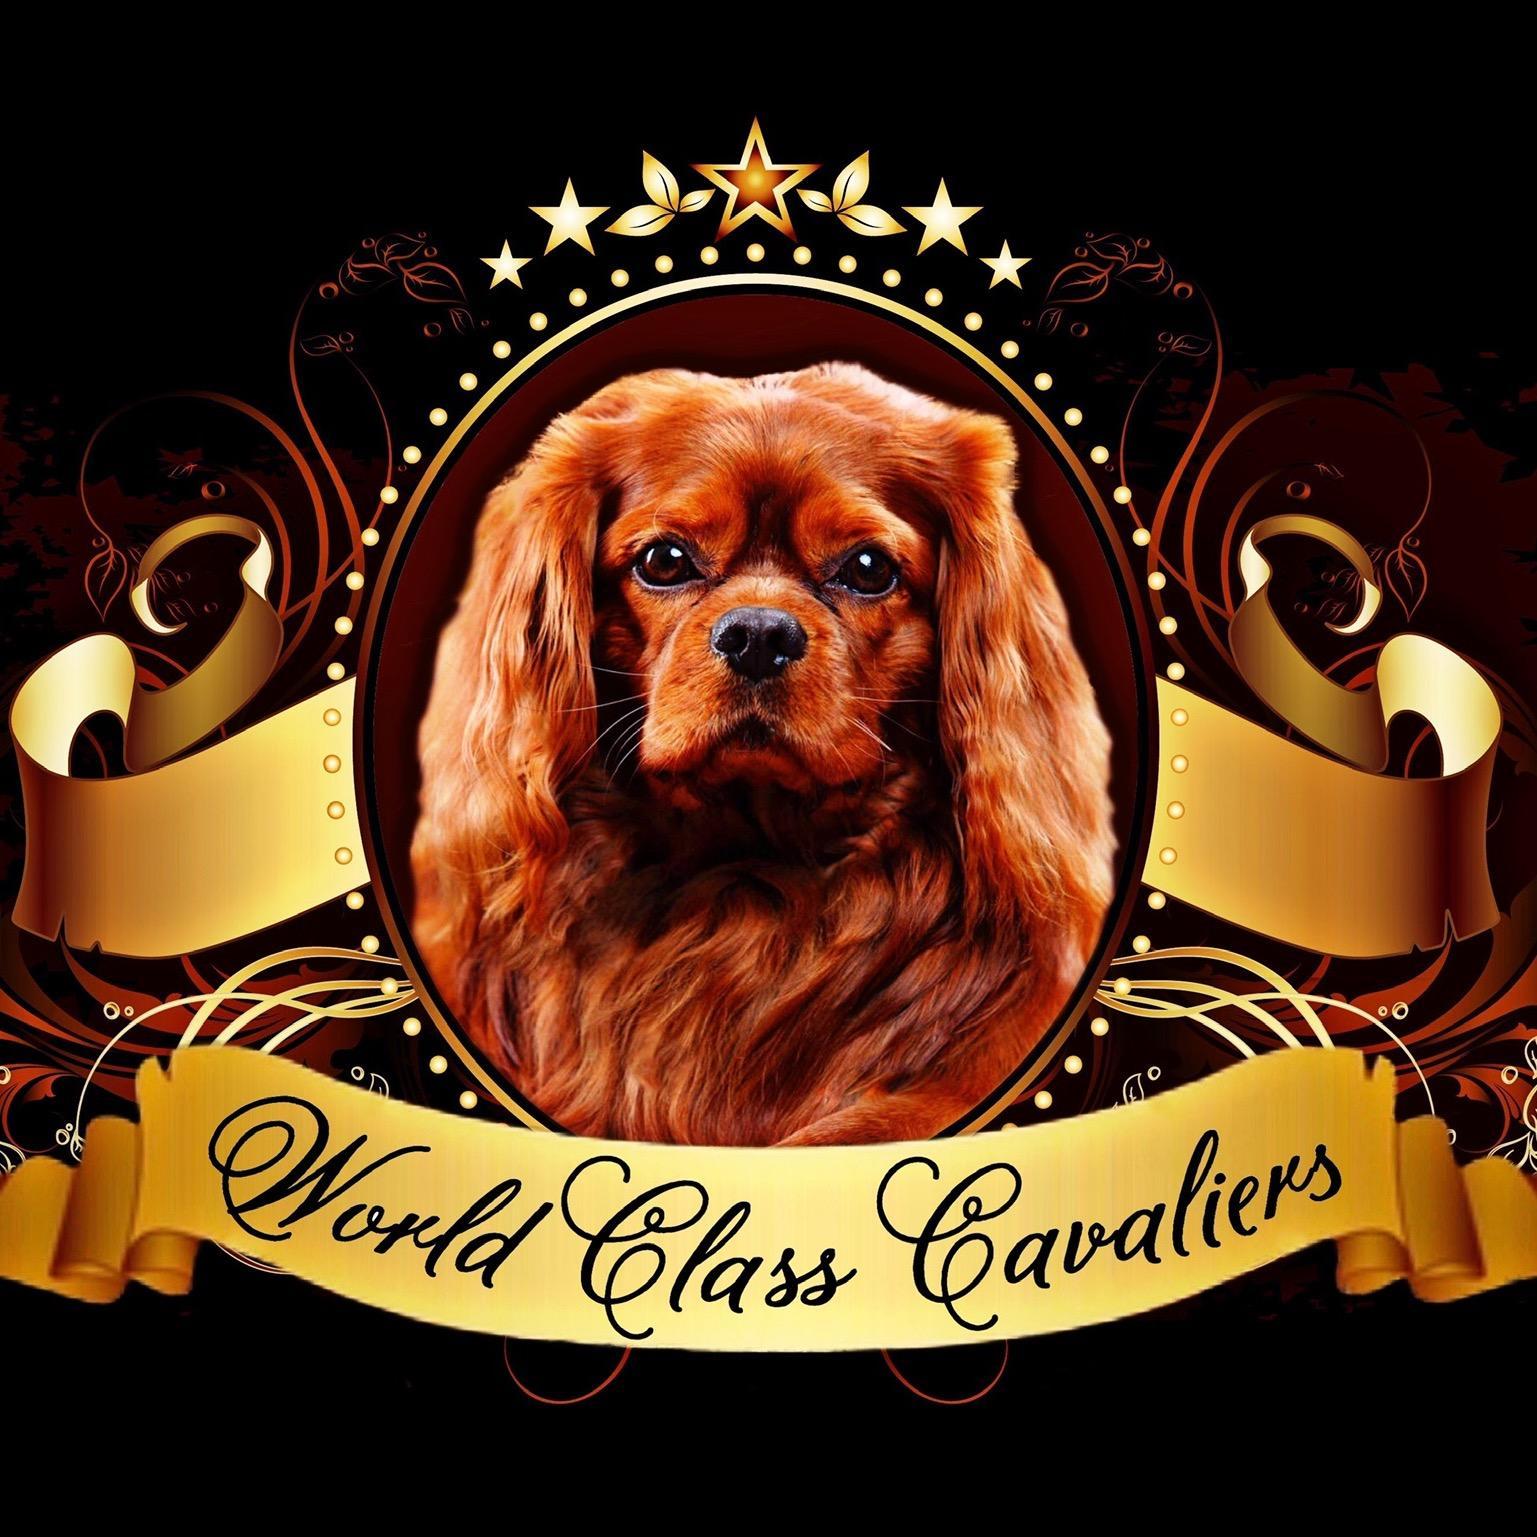 World Class Cavaliers LLC - Miami, FL 33142 - (786)589-1338 | ShowMeLocal.com